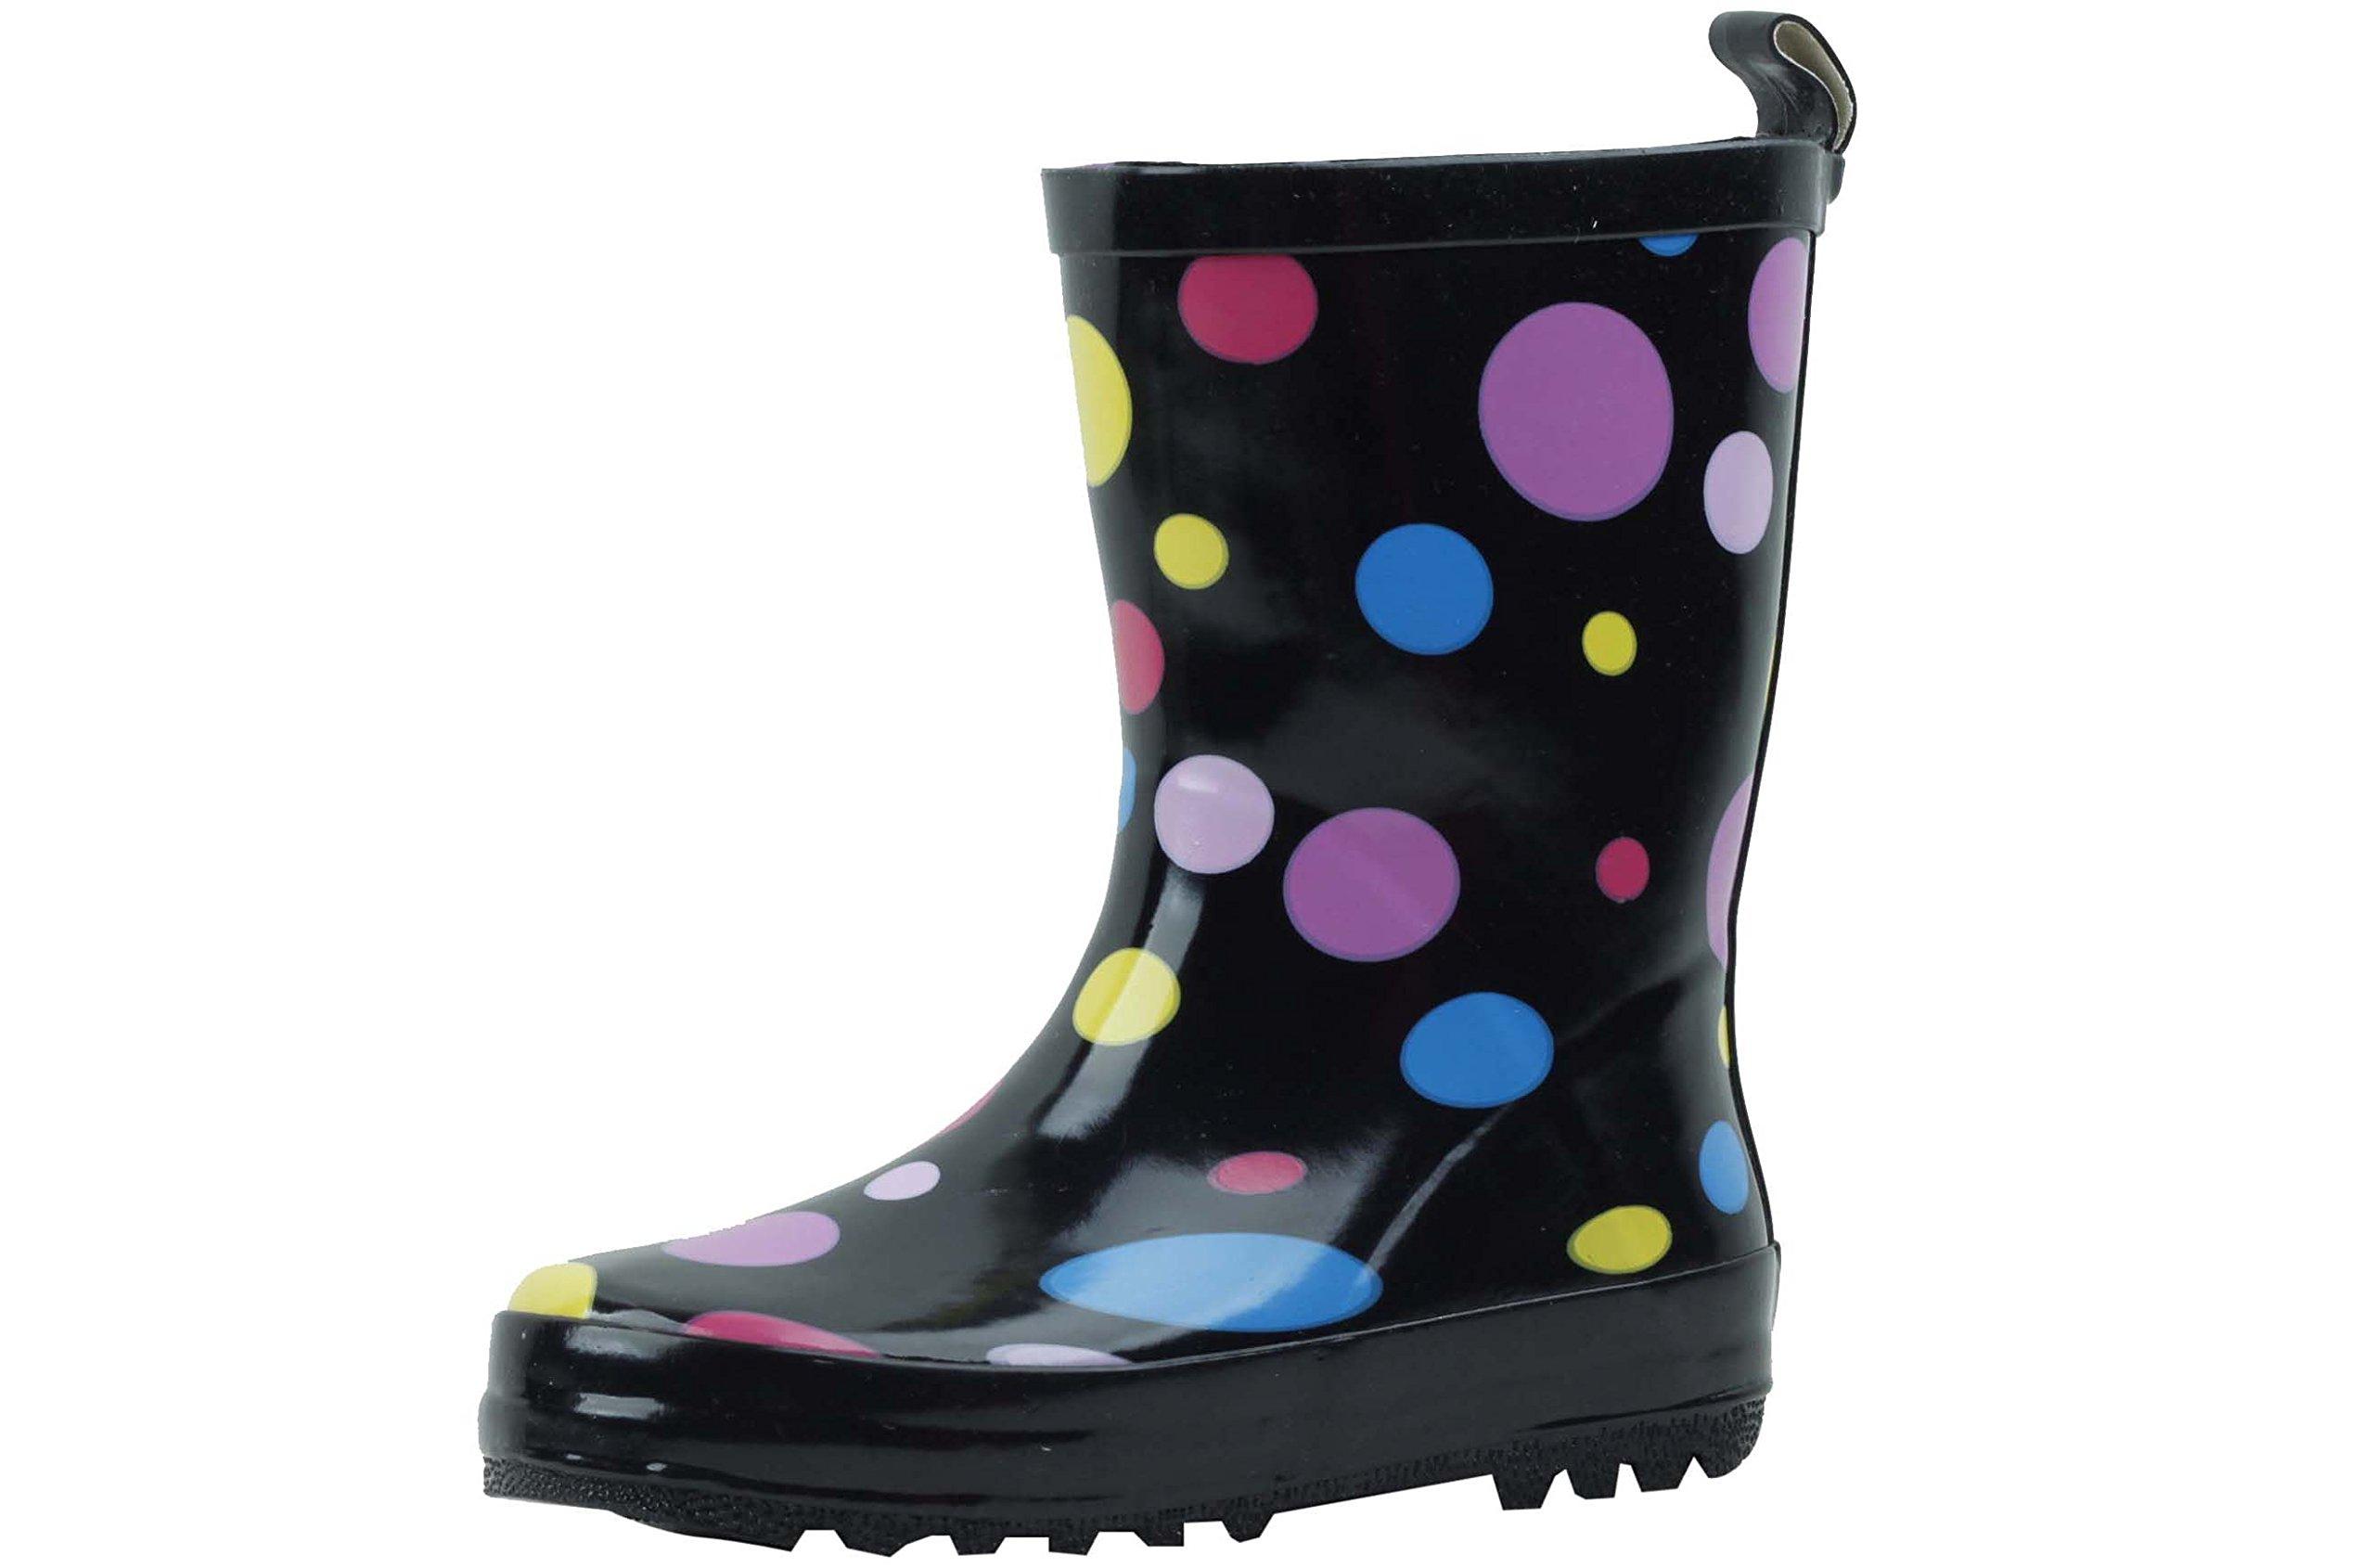 G4U-B0A01S Children's Kids Rain Boots Multiple Styles Color Rubber Strap Waterproof Boys Girls Snow Shoes (4 M US Big Kid, Multi-Color Polka Dots-1)